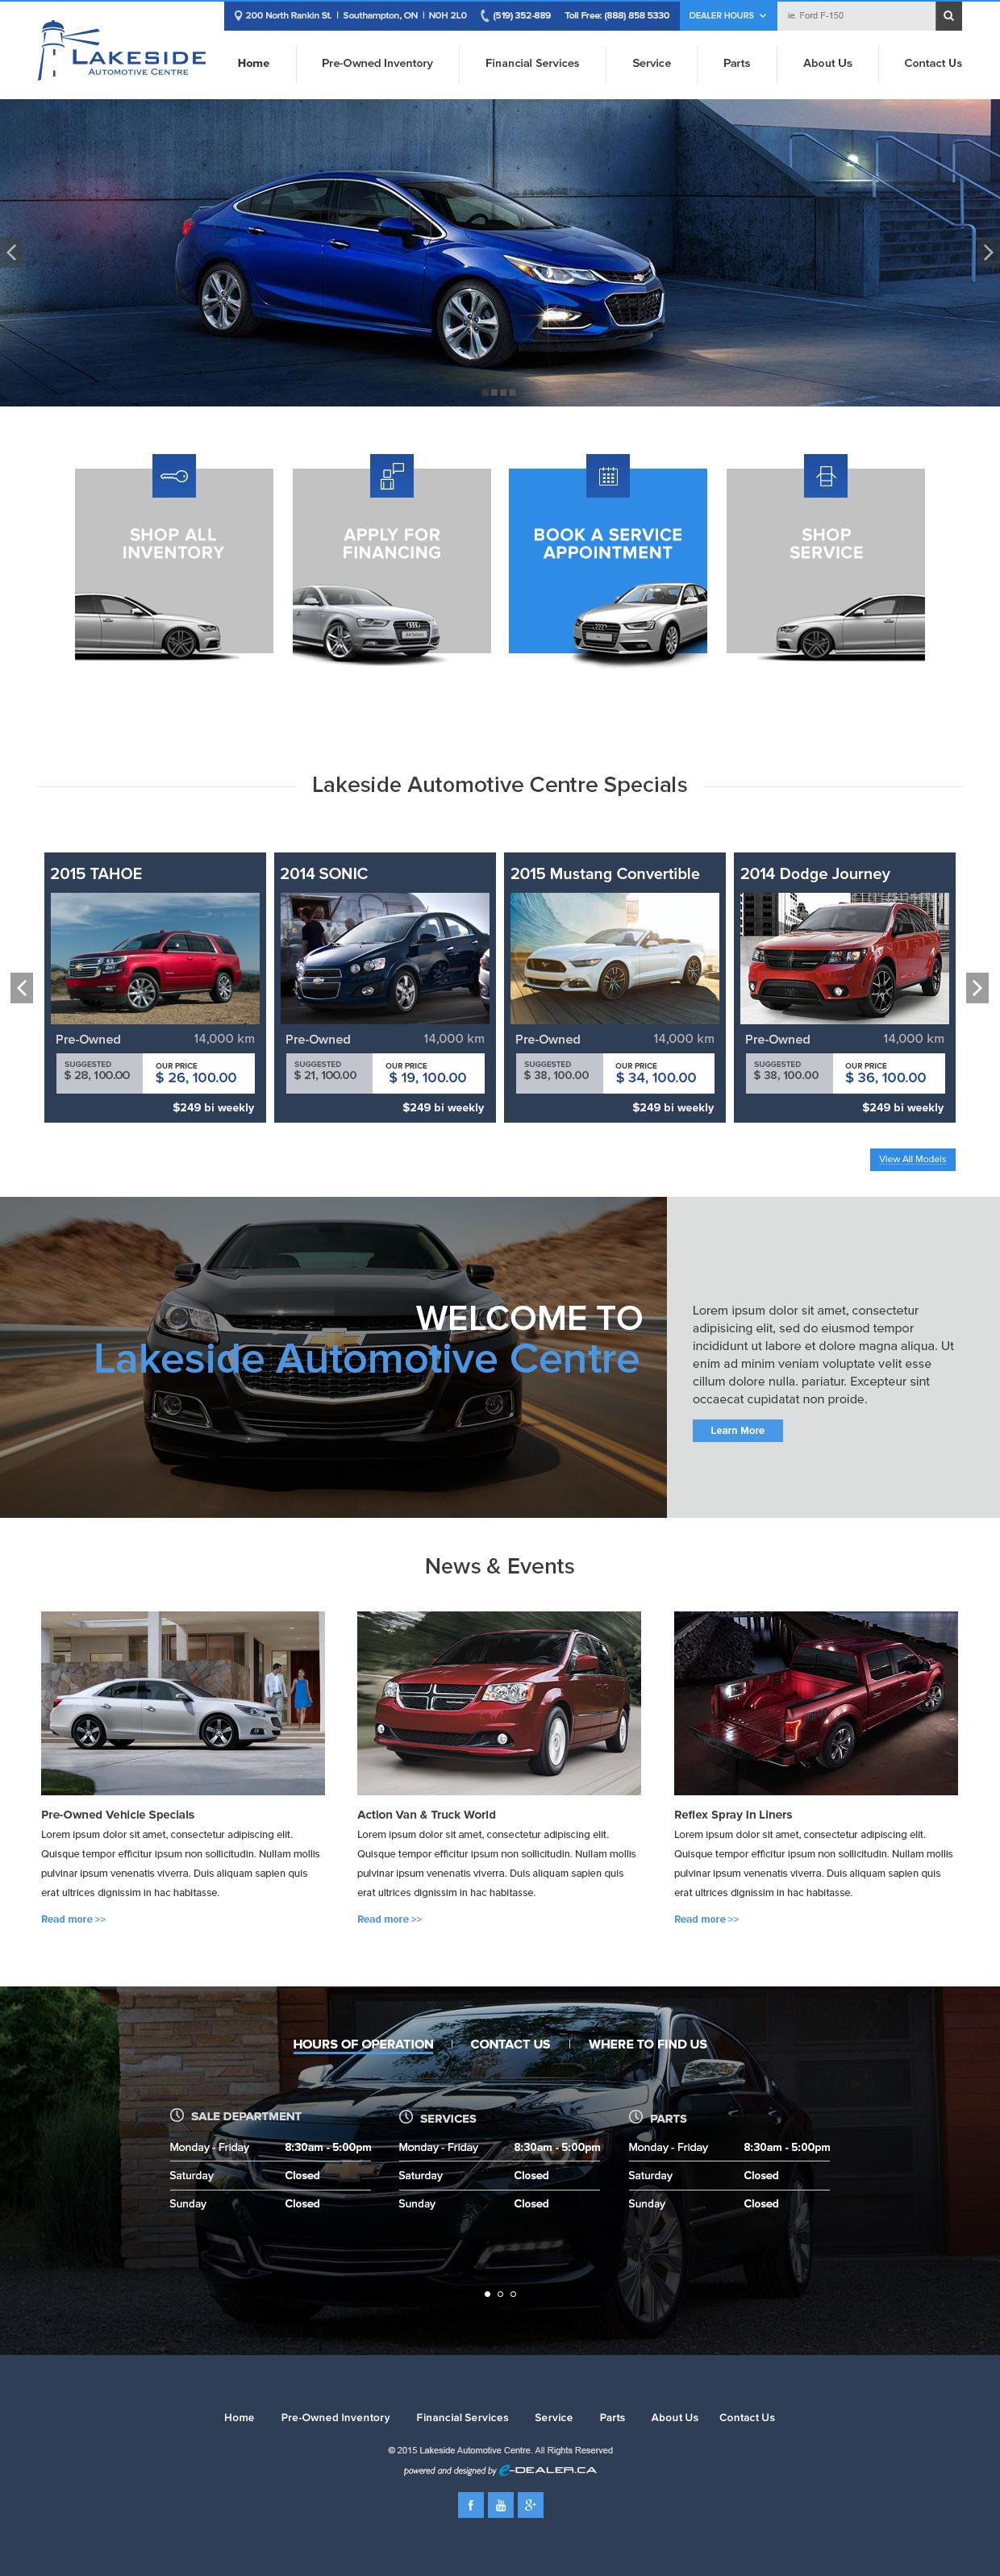 Lakeside-Automotive-Centre-Website